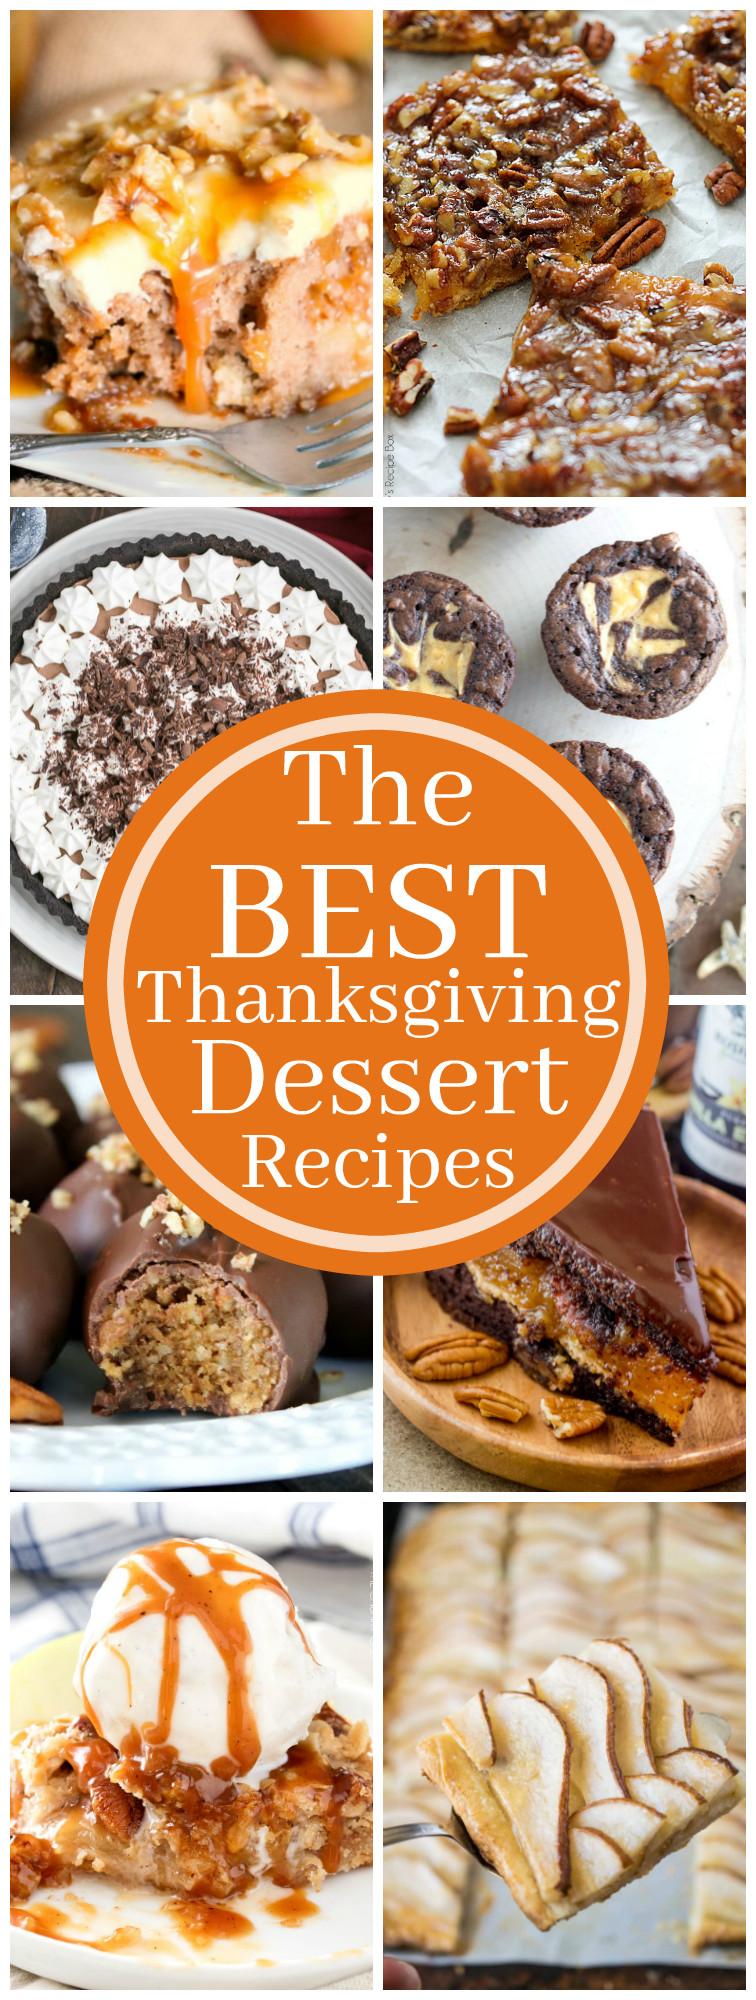 Best Thanksgiving Dessert Recipes  The Best Thanksgiving Dessert Recipes The Chunky Chef